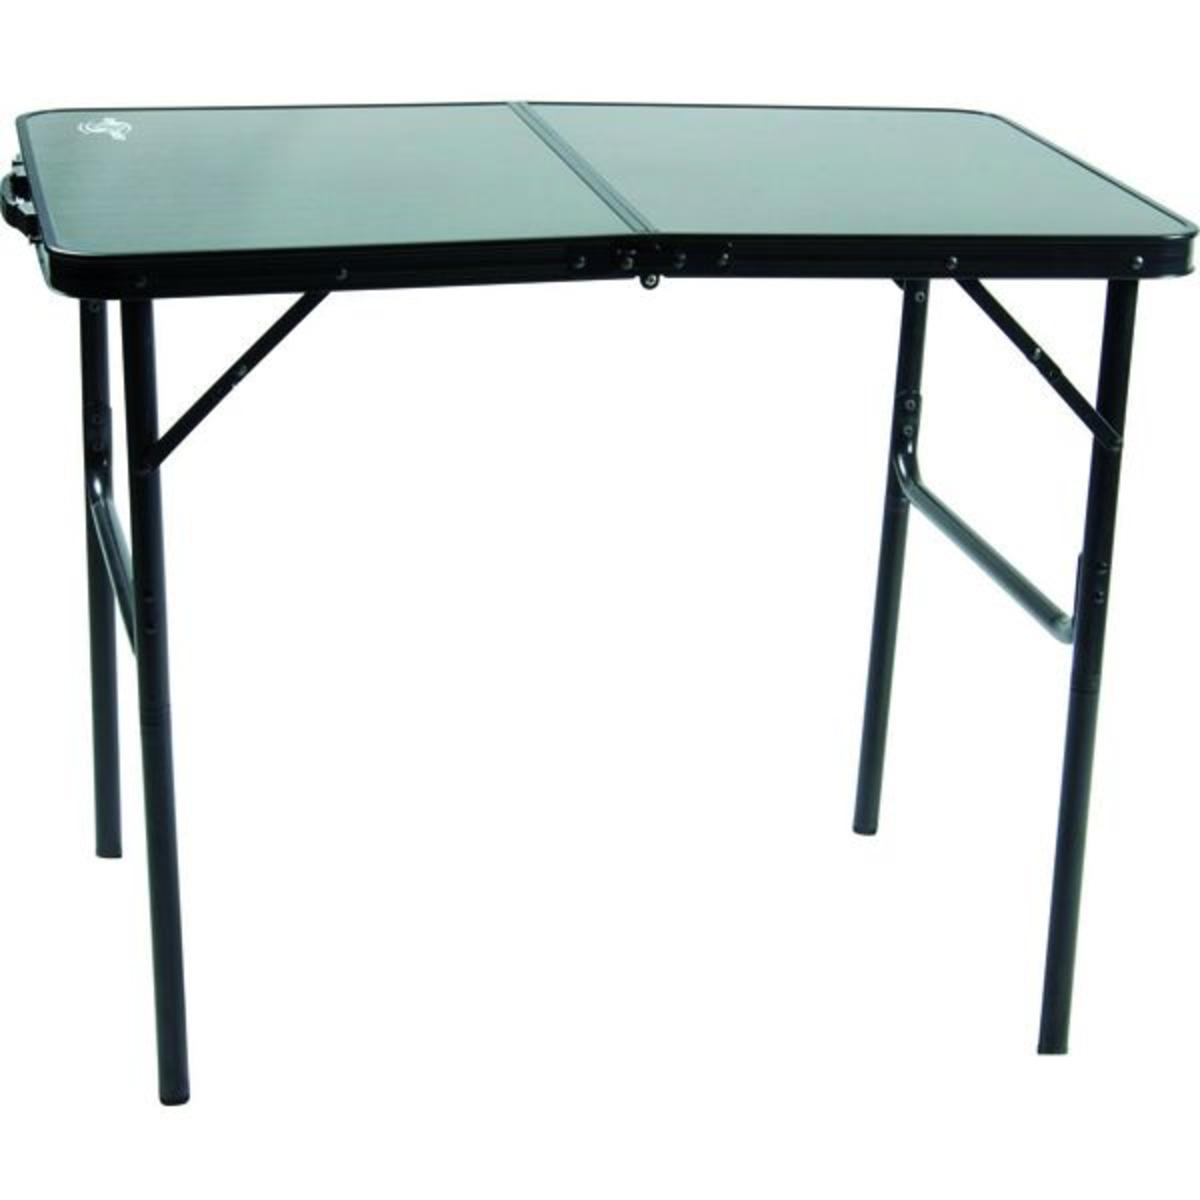 Carp Spirit Foldable Camping Table - 90x60 cm